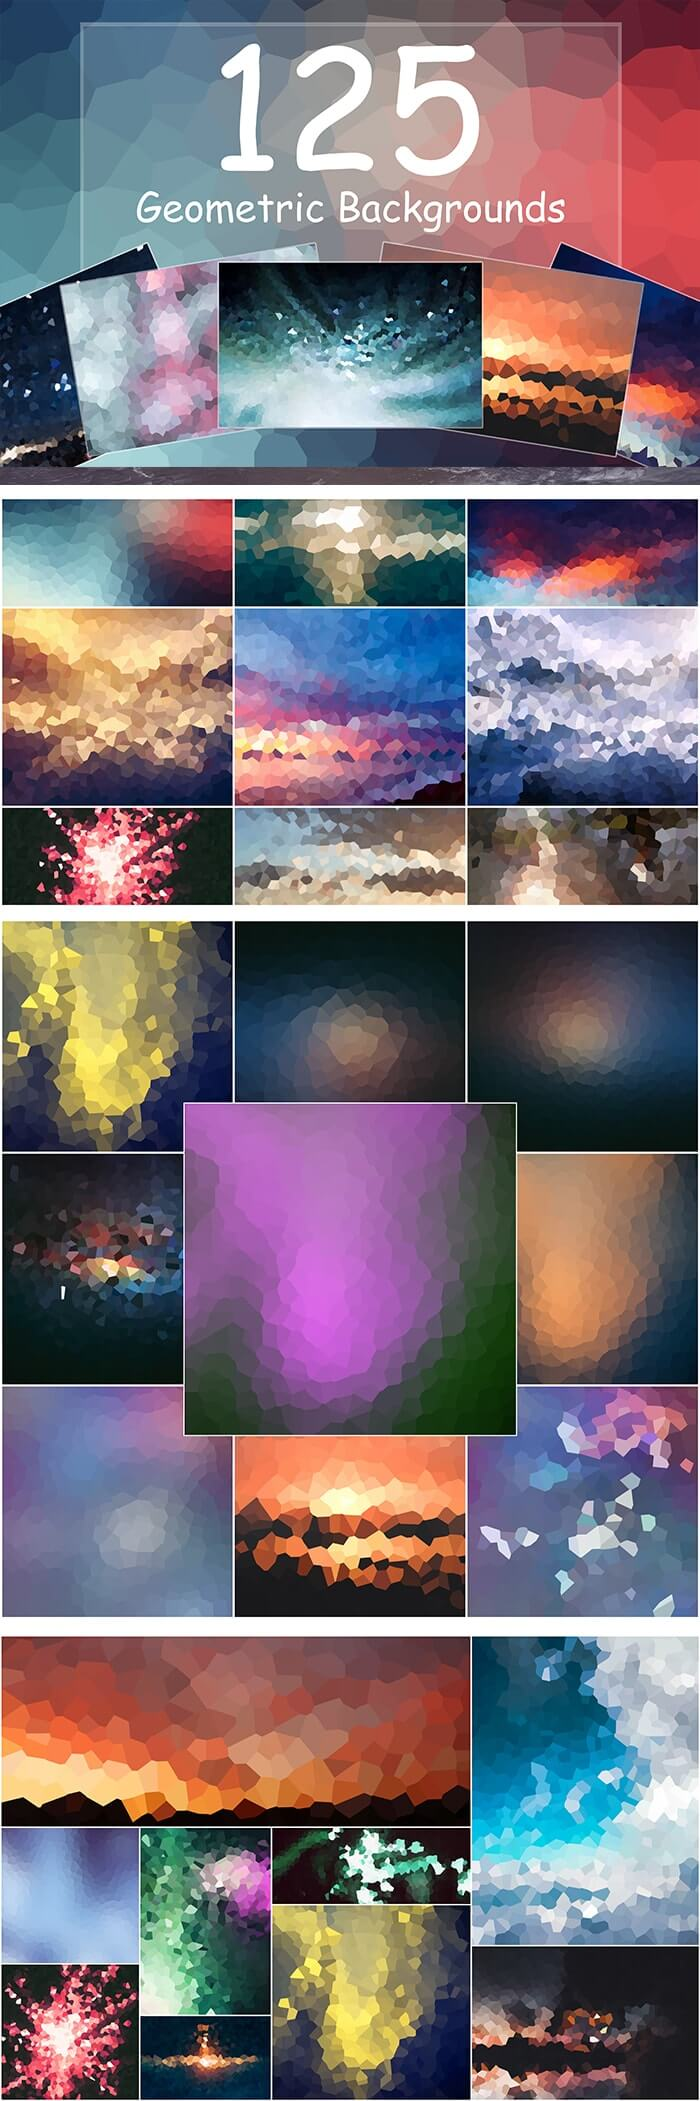 2000+ High Resolution Digital Backgrounds Bundle - $29 - 125 Geometric Backgrounds